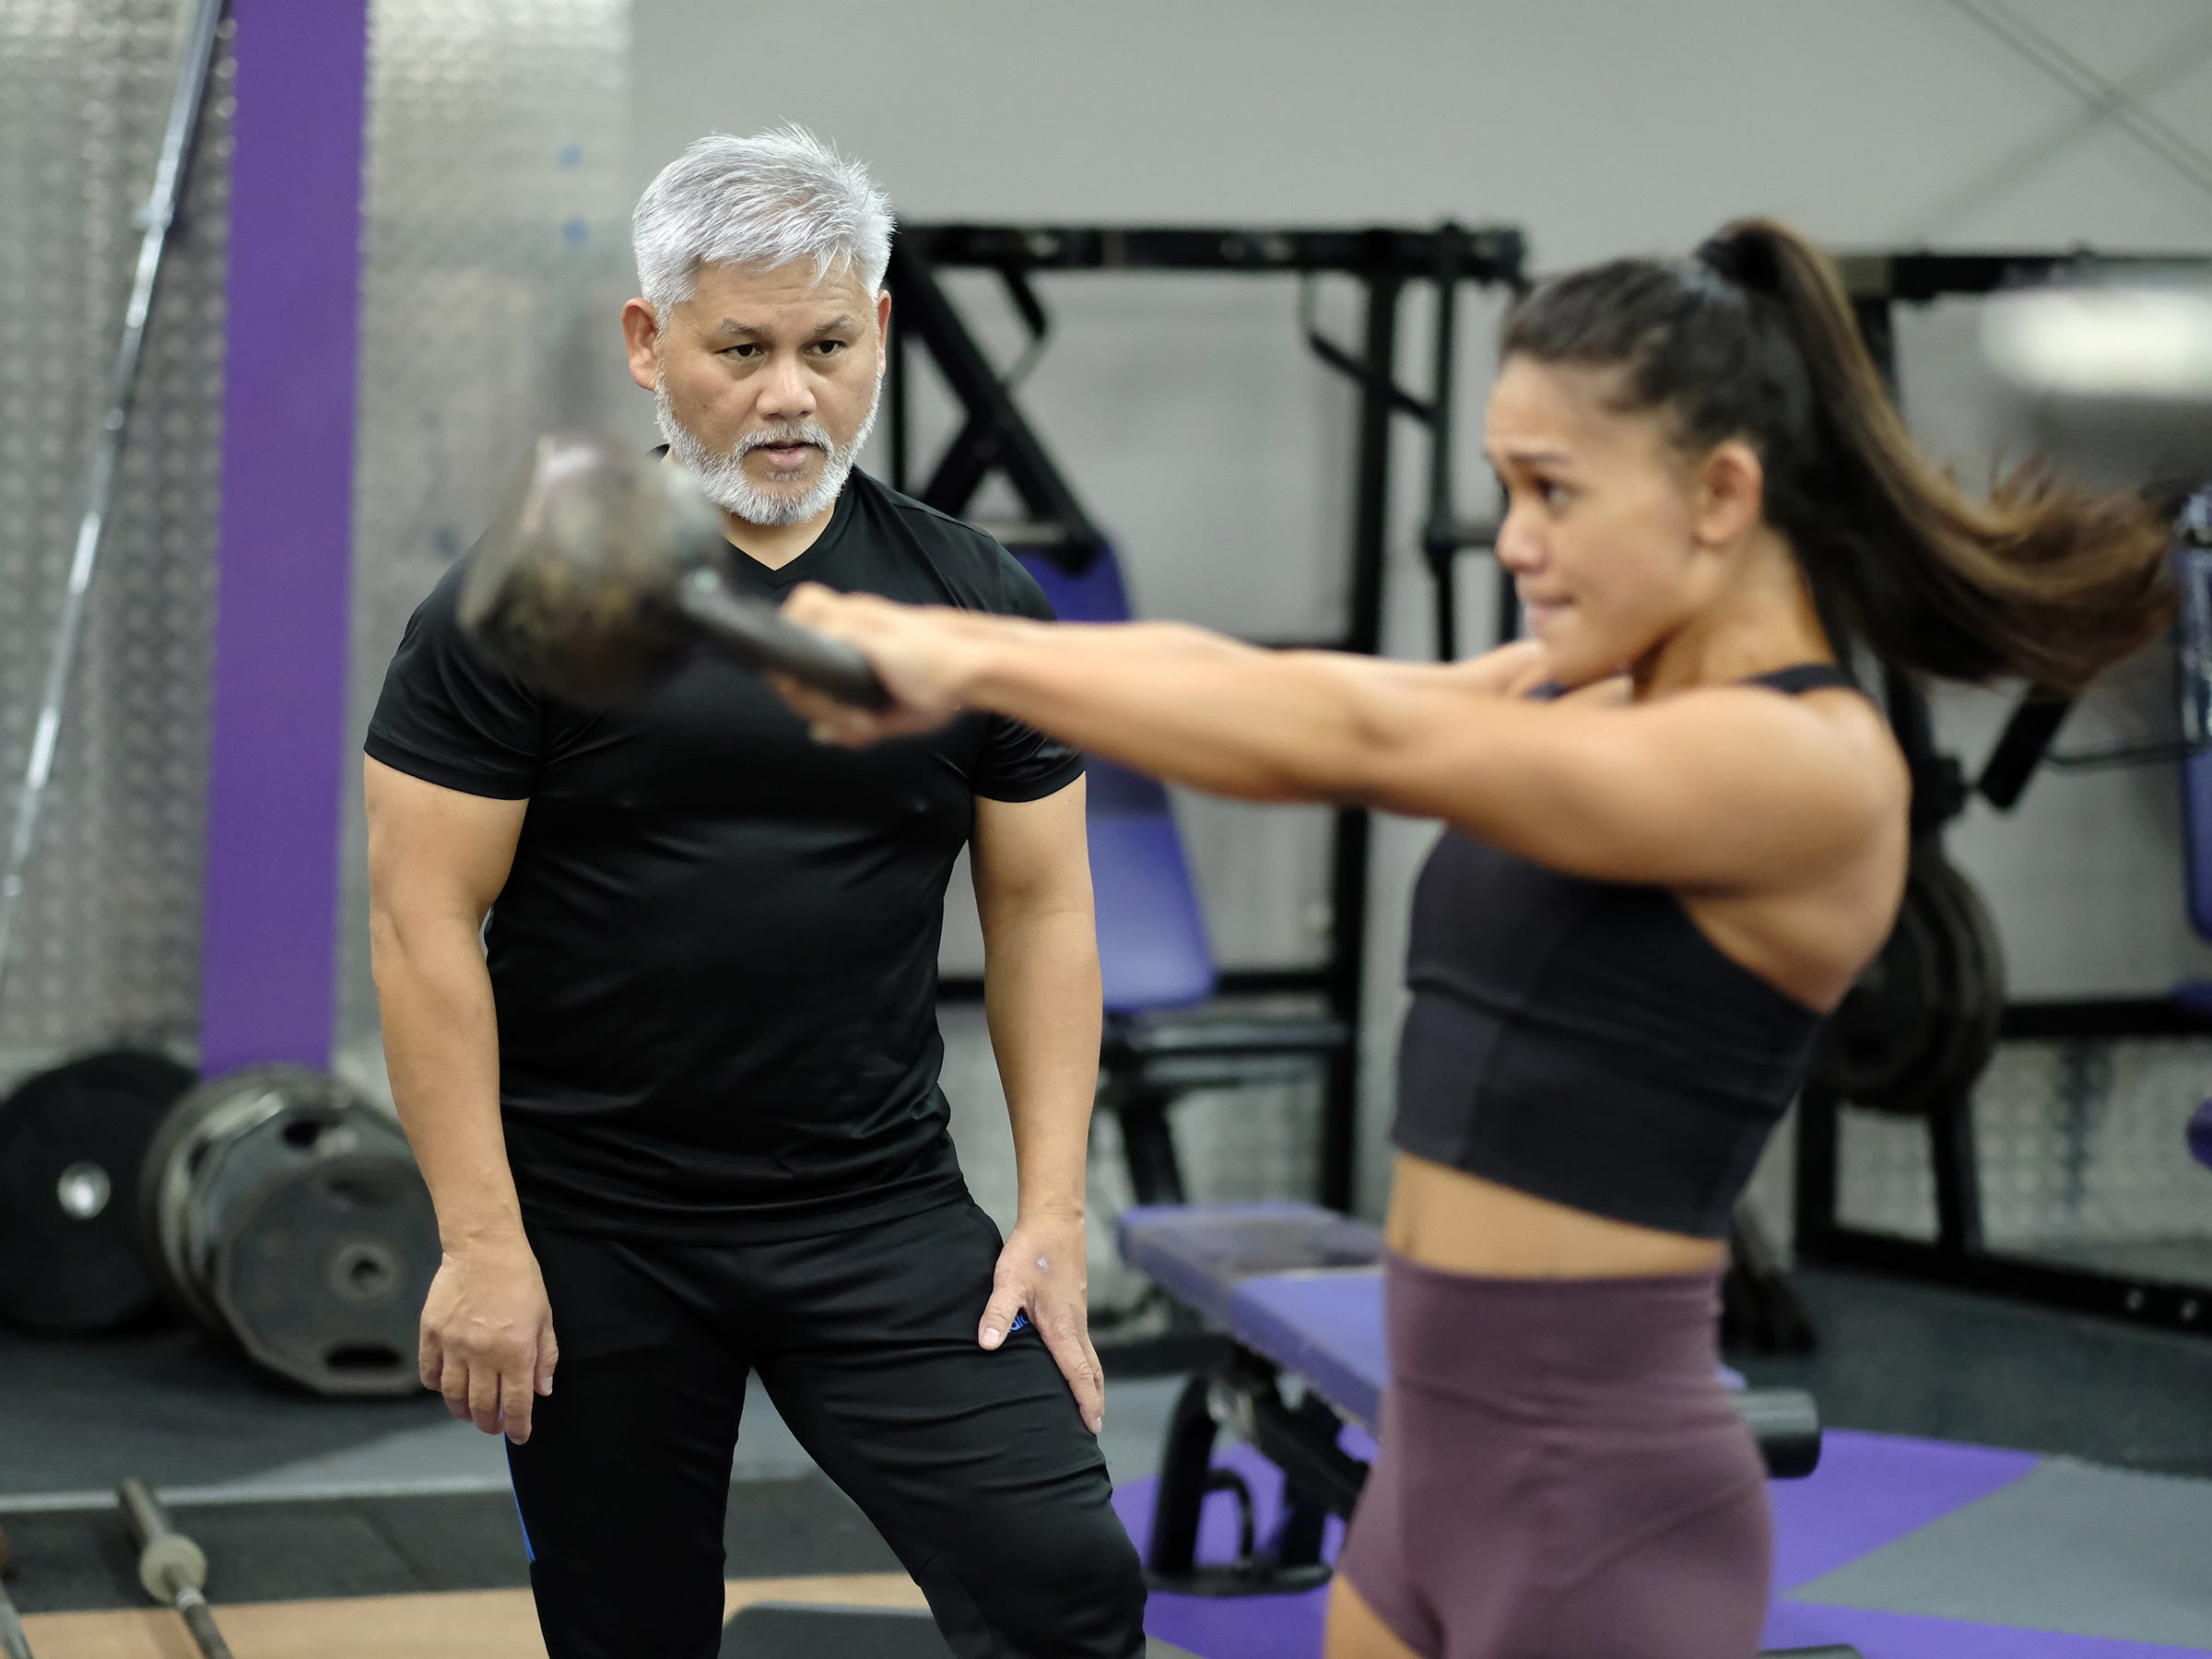 Steve Oshiro trains Jeralyn Mesa at Paradise Fitness in Hagatna November 15, 2018. Oshiro has trained many physique and bodybuilding contest winners.